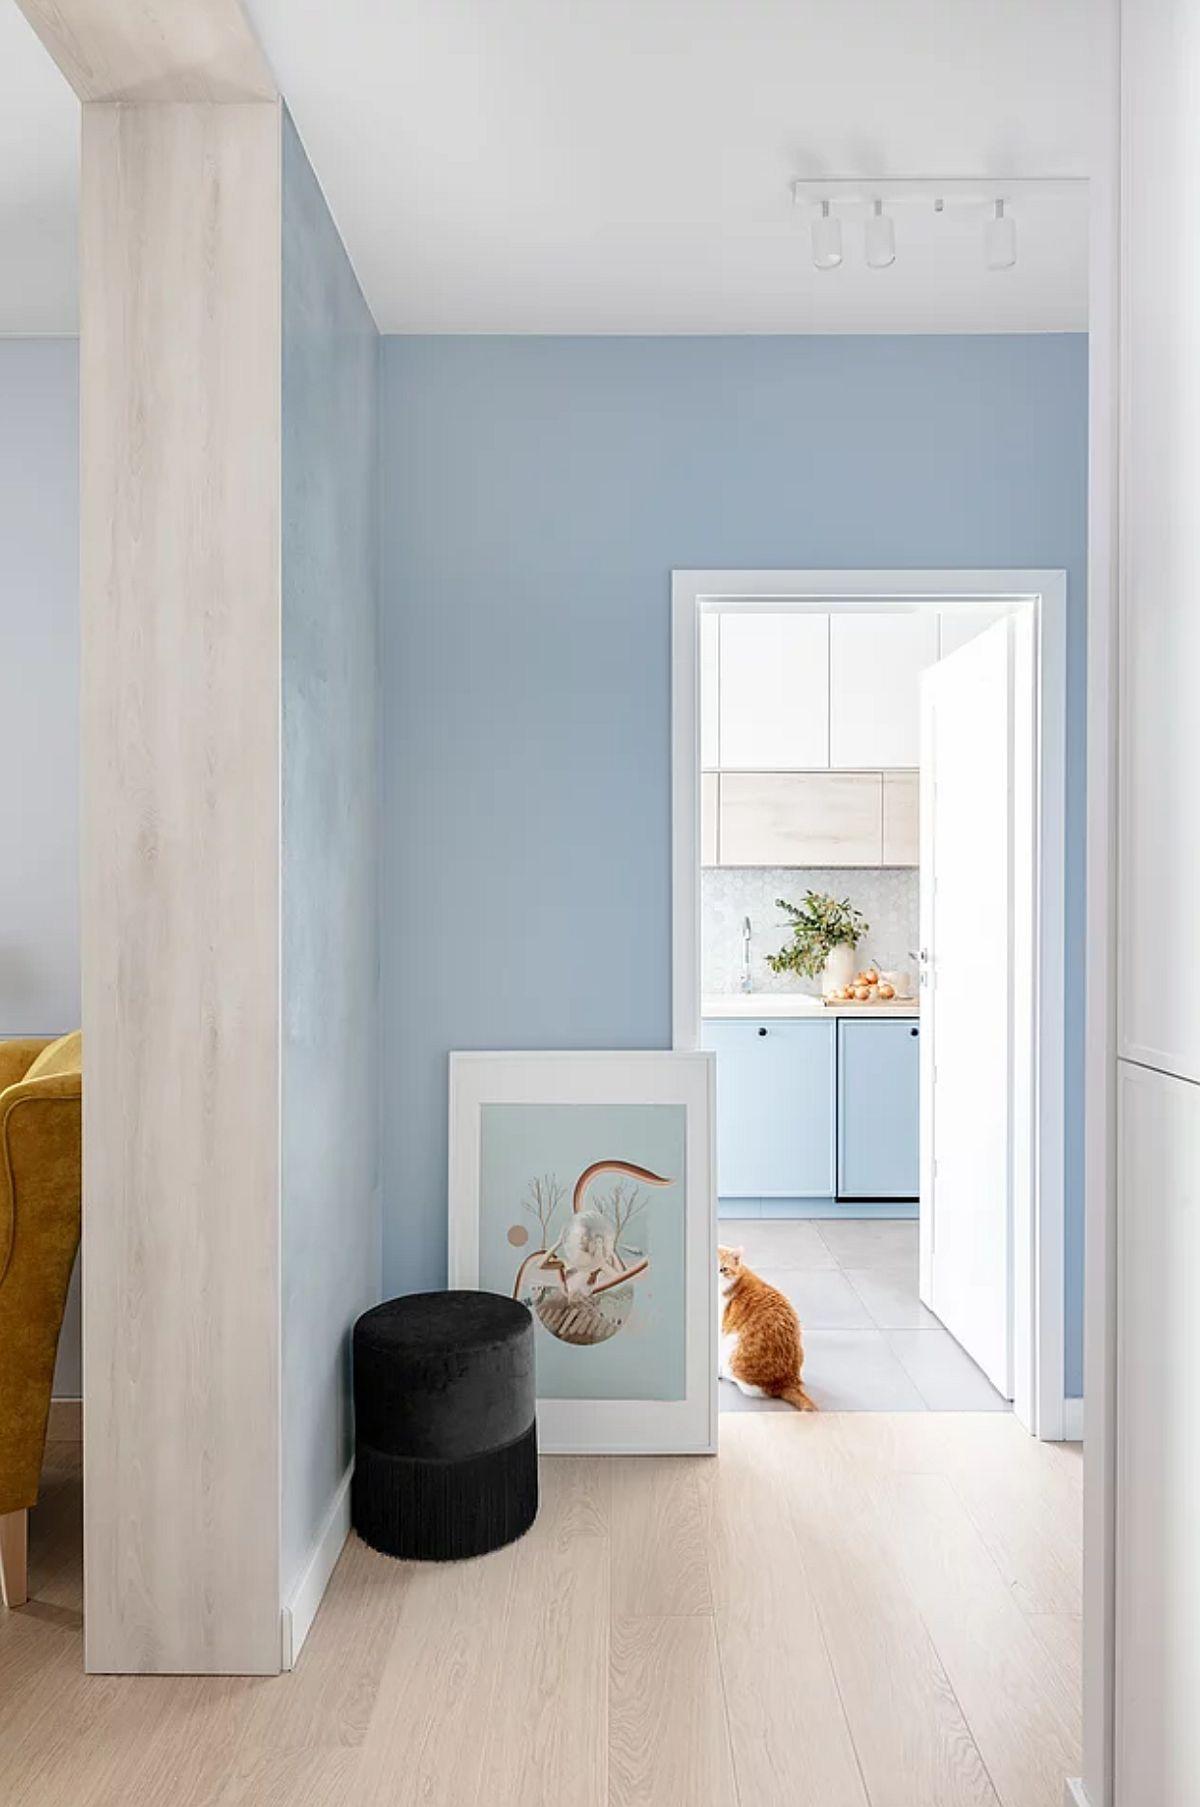 adelaparvu.com despre amenajare living, bucatarie, baie in albastru, design Design My Deer, Foto Ayuko Studio (11)